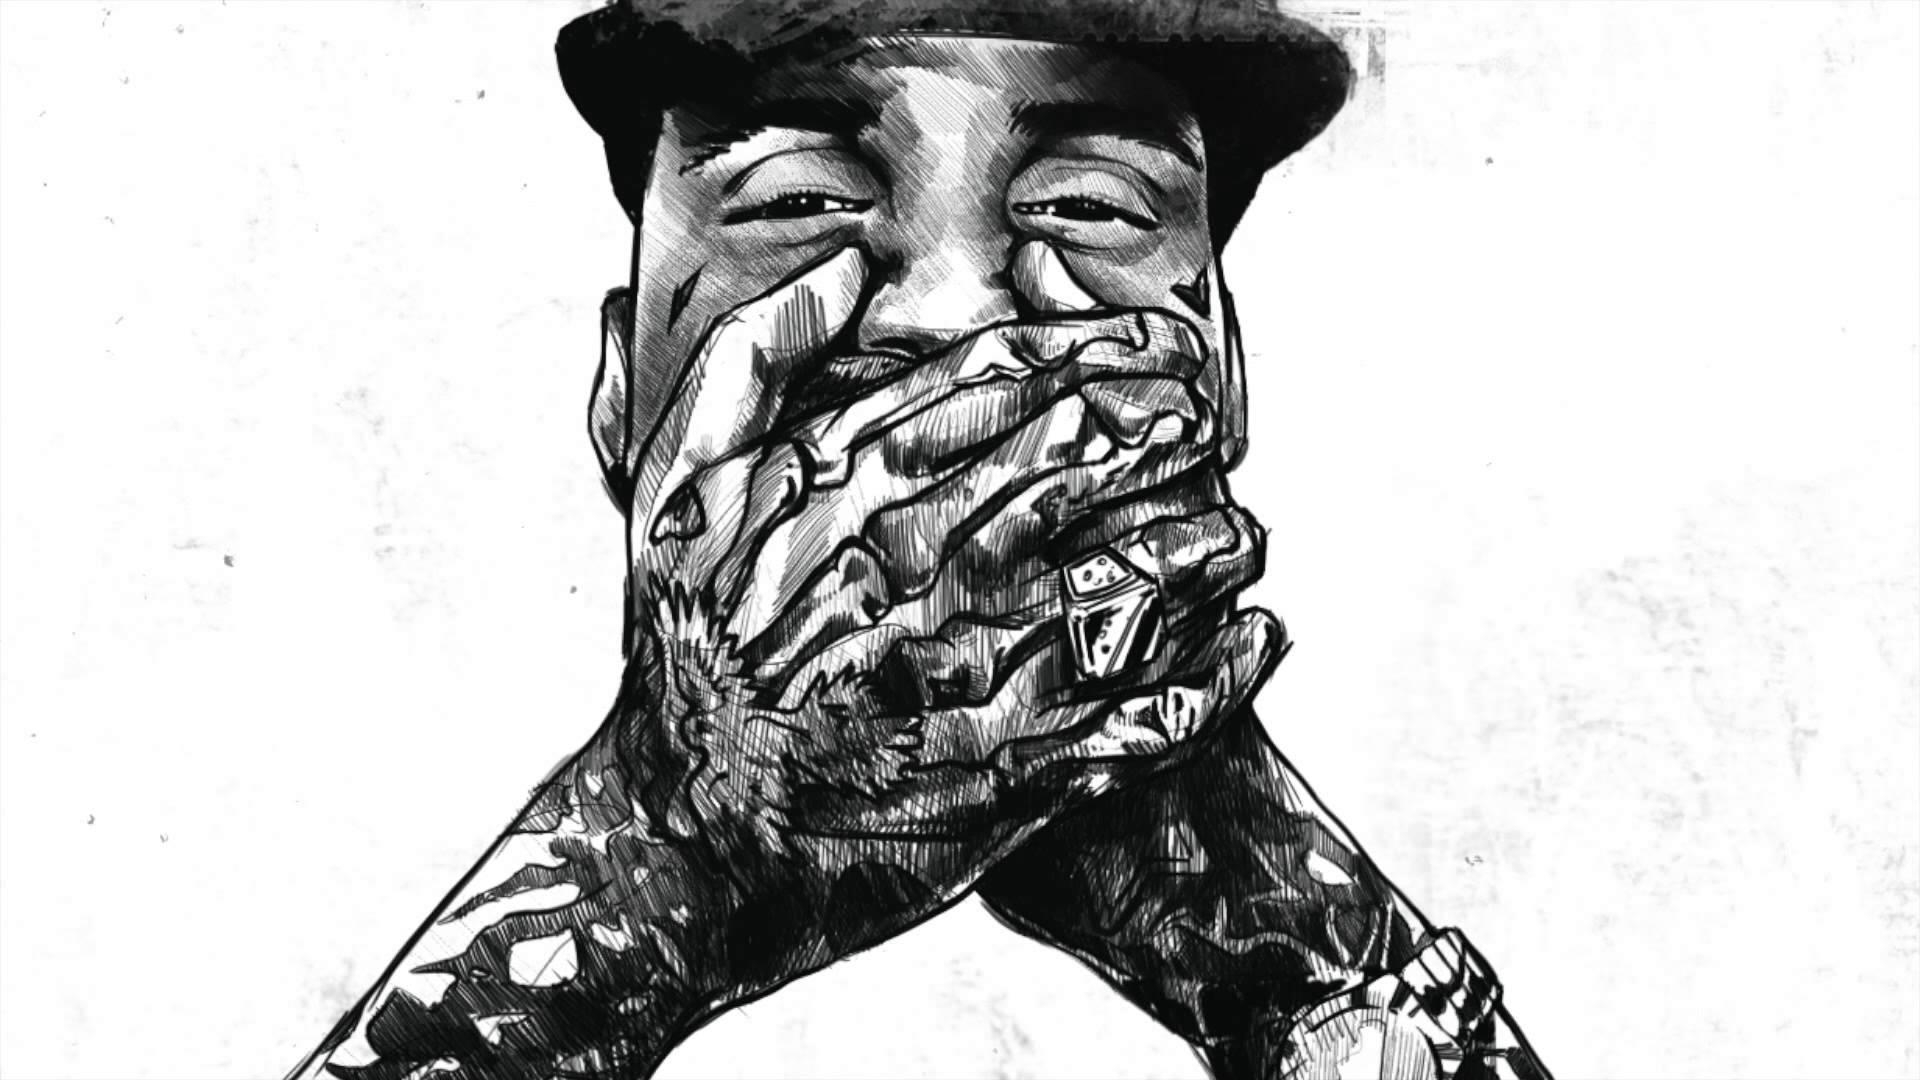 Kid ink wallpaper hd wallpapersafari - Hd ink wallpaper ...